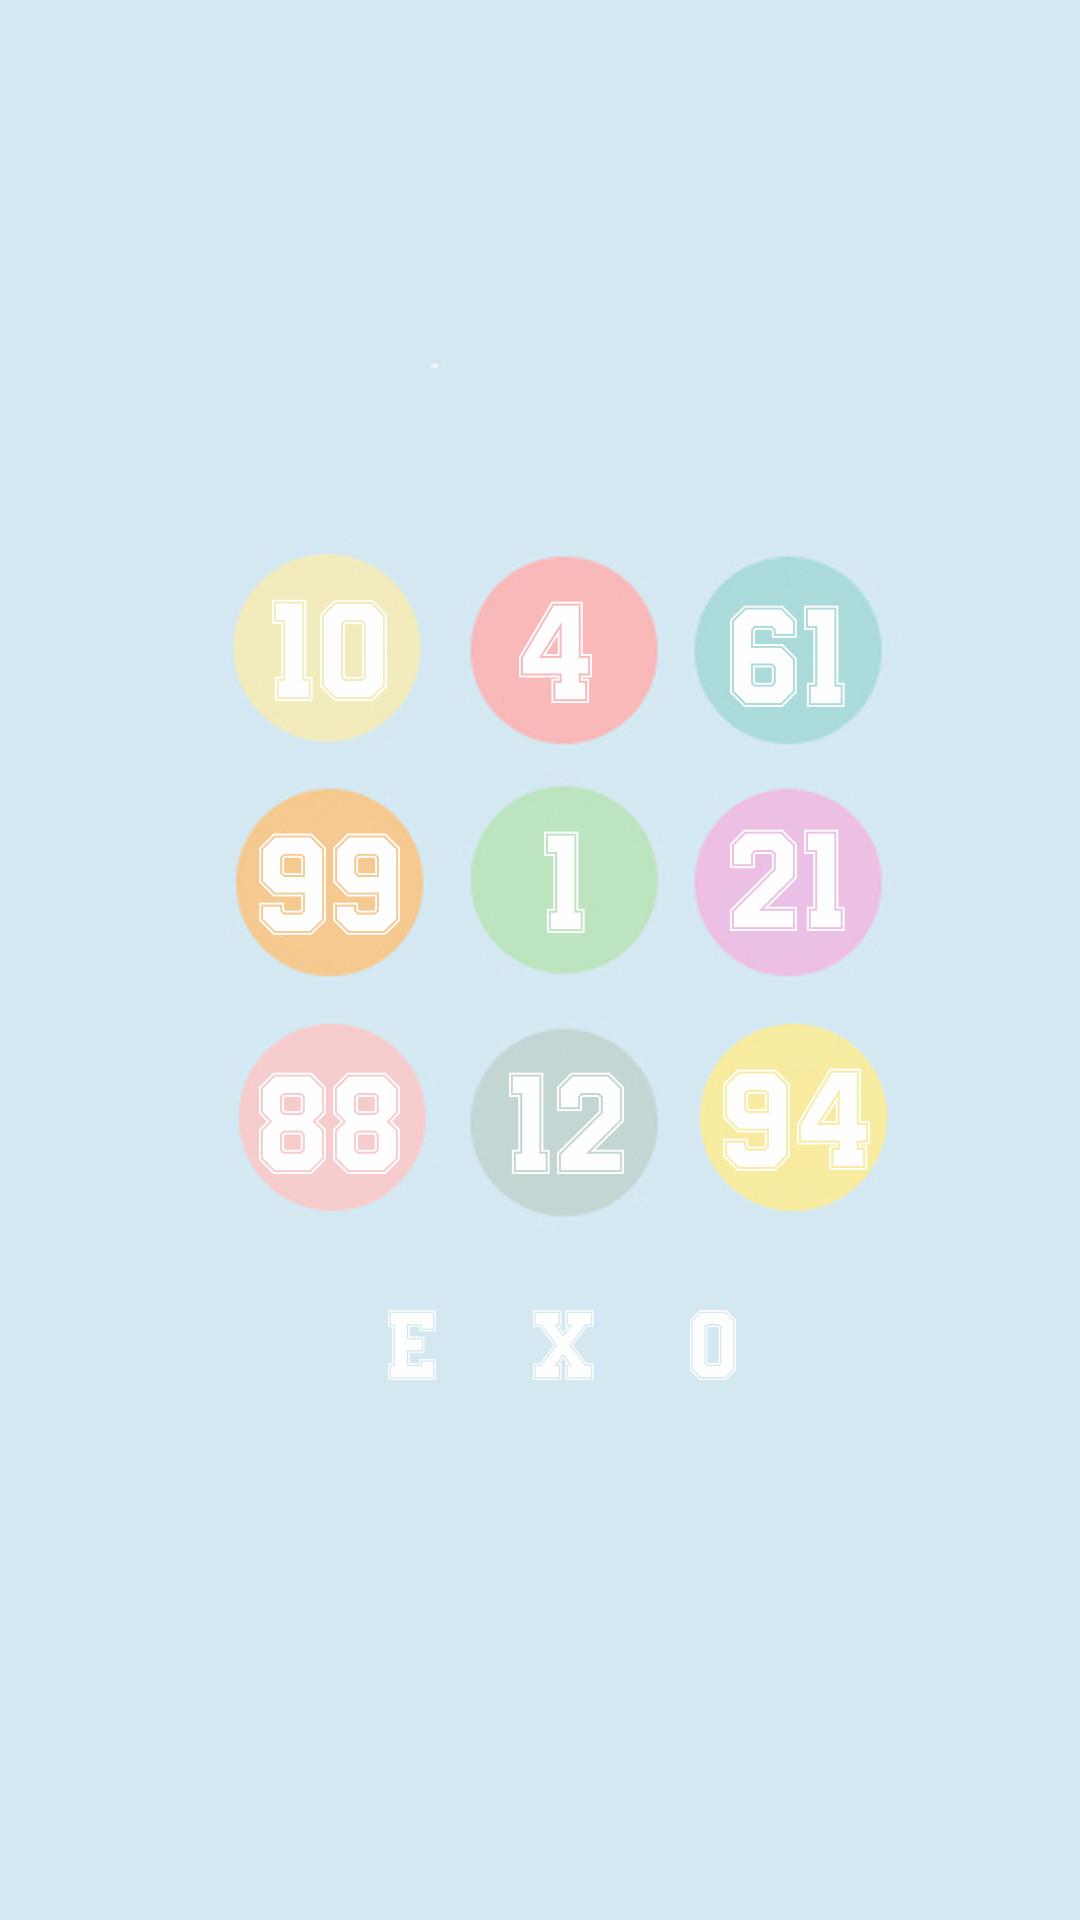 Exo Wallpaper Iphone Group Of Exo Wallpaper On Tumblr Exo Logo